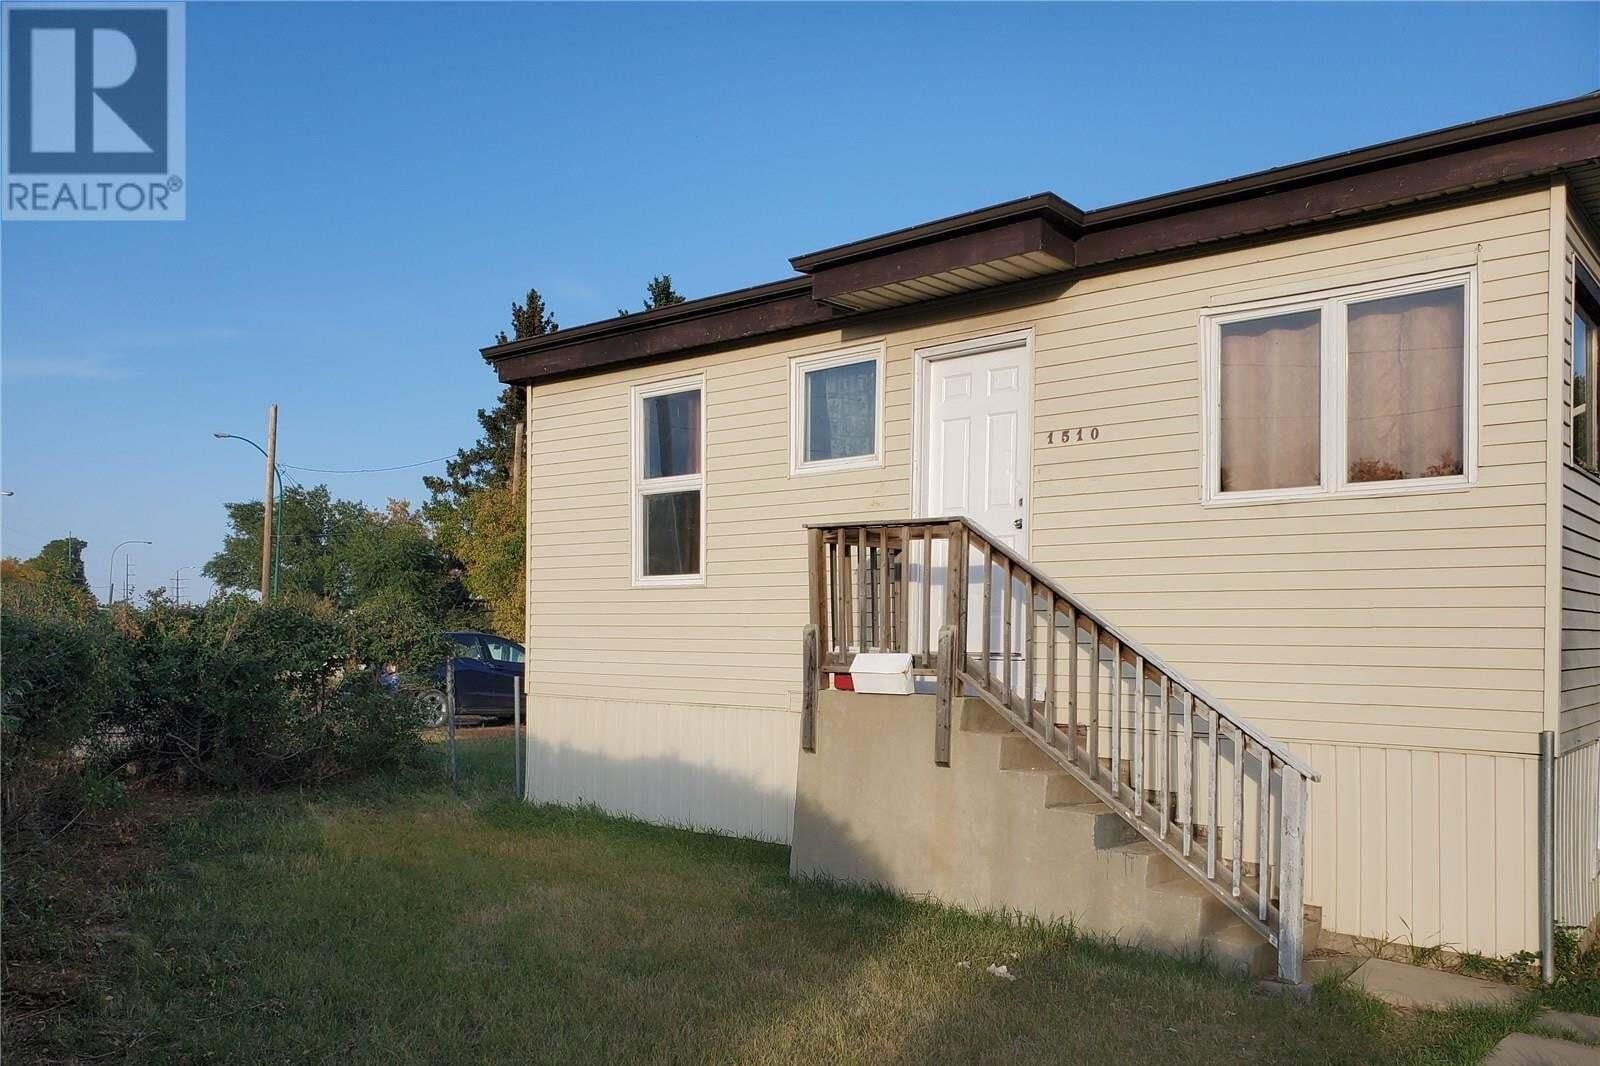 House for sale at 1510 Warman Rd Saskatoon Saskatchewan - MLS: SK827782